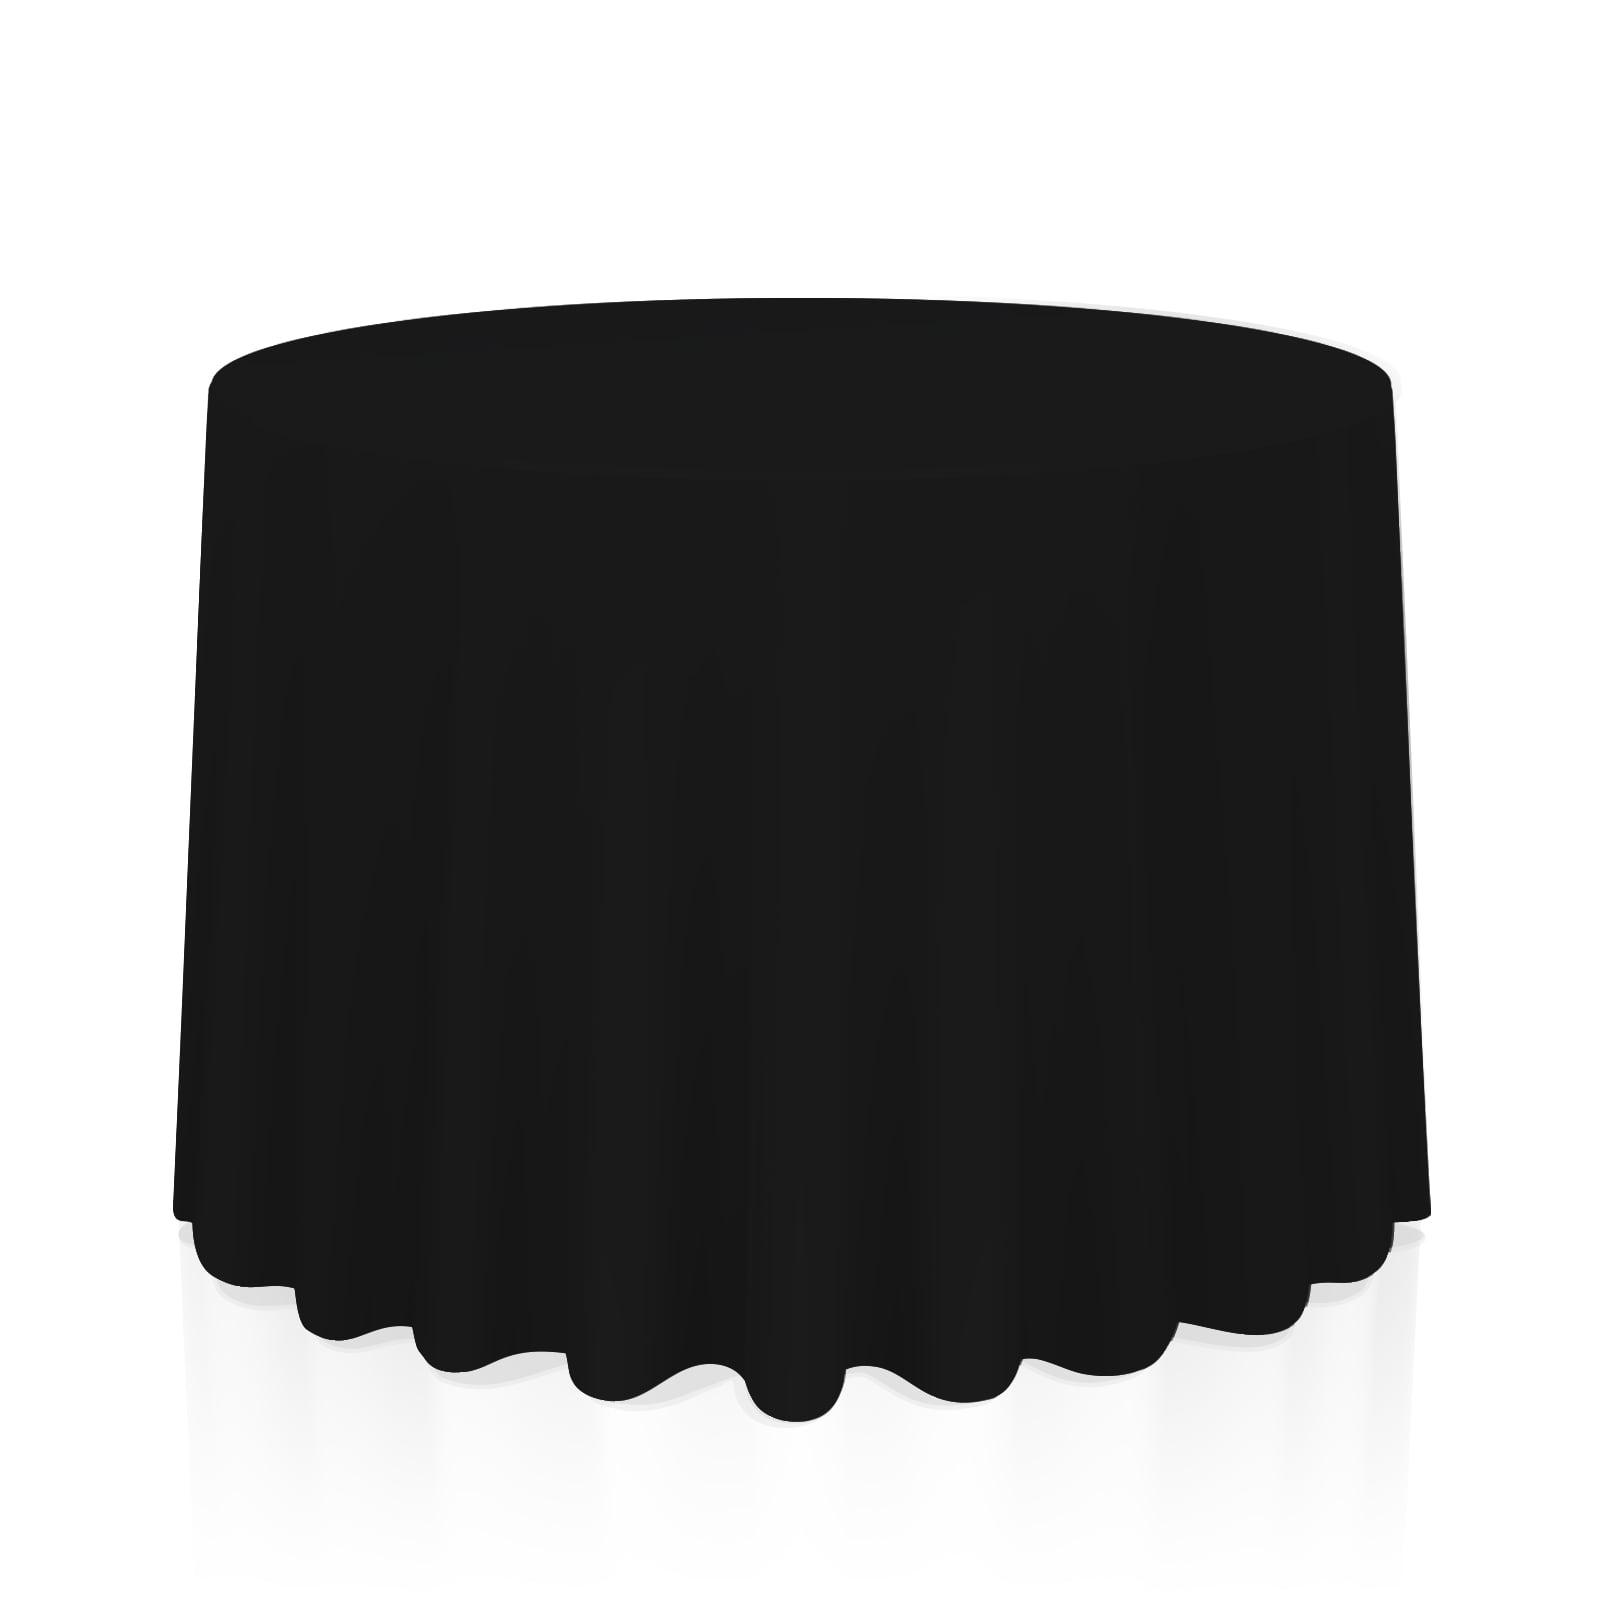 Lann's Linens 10 Premium Round Tablecloths for Wedding   Banquet   Restaurant Polyester... by Lann's Linens